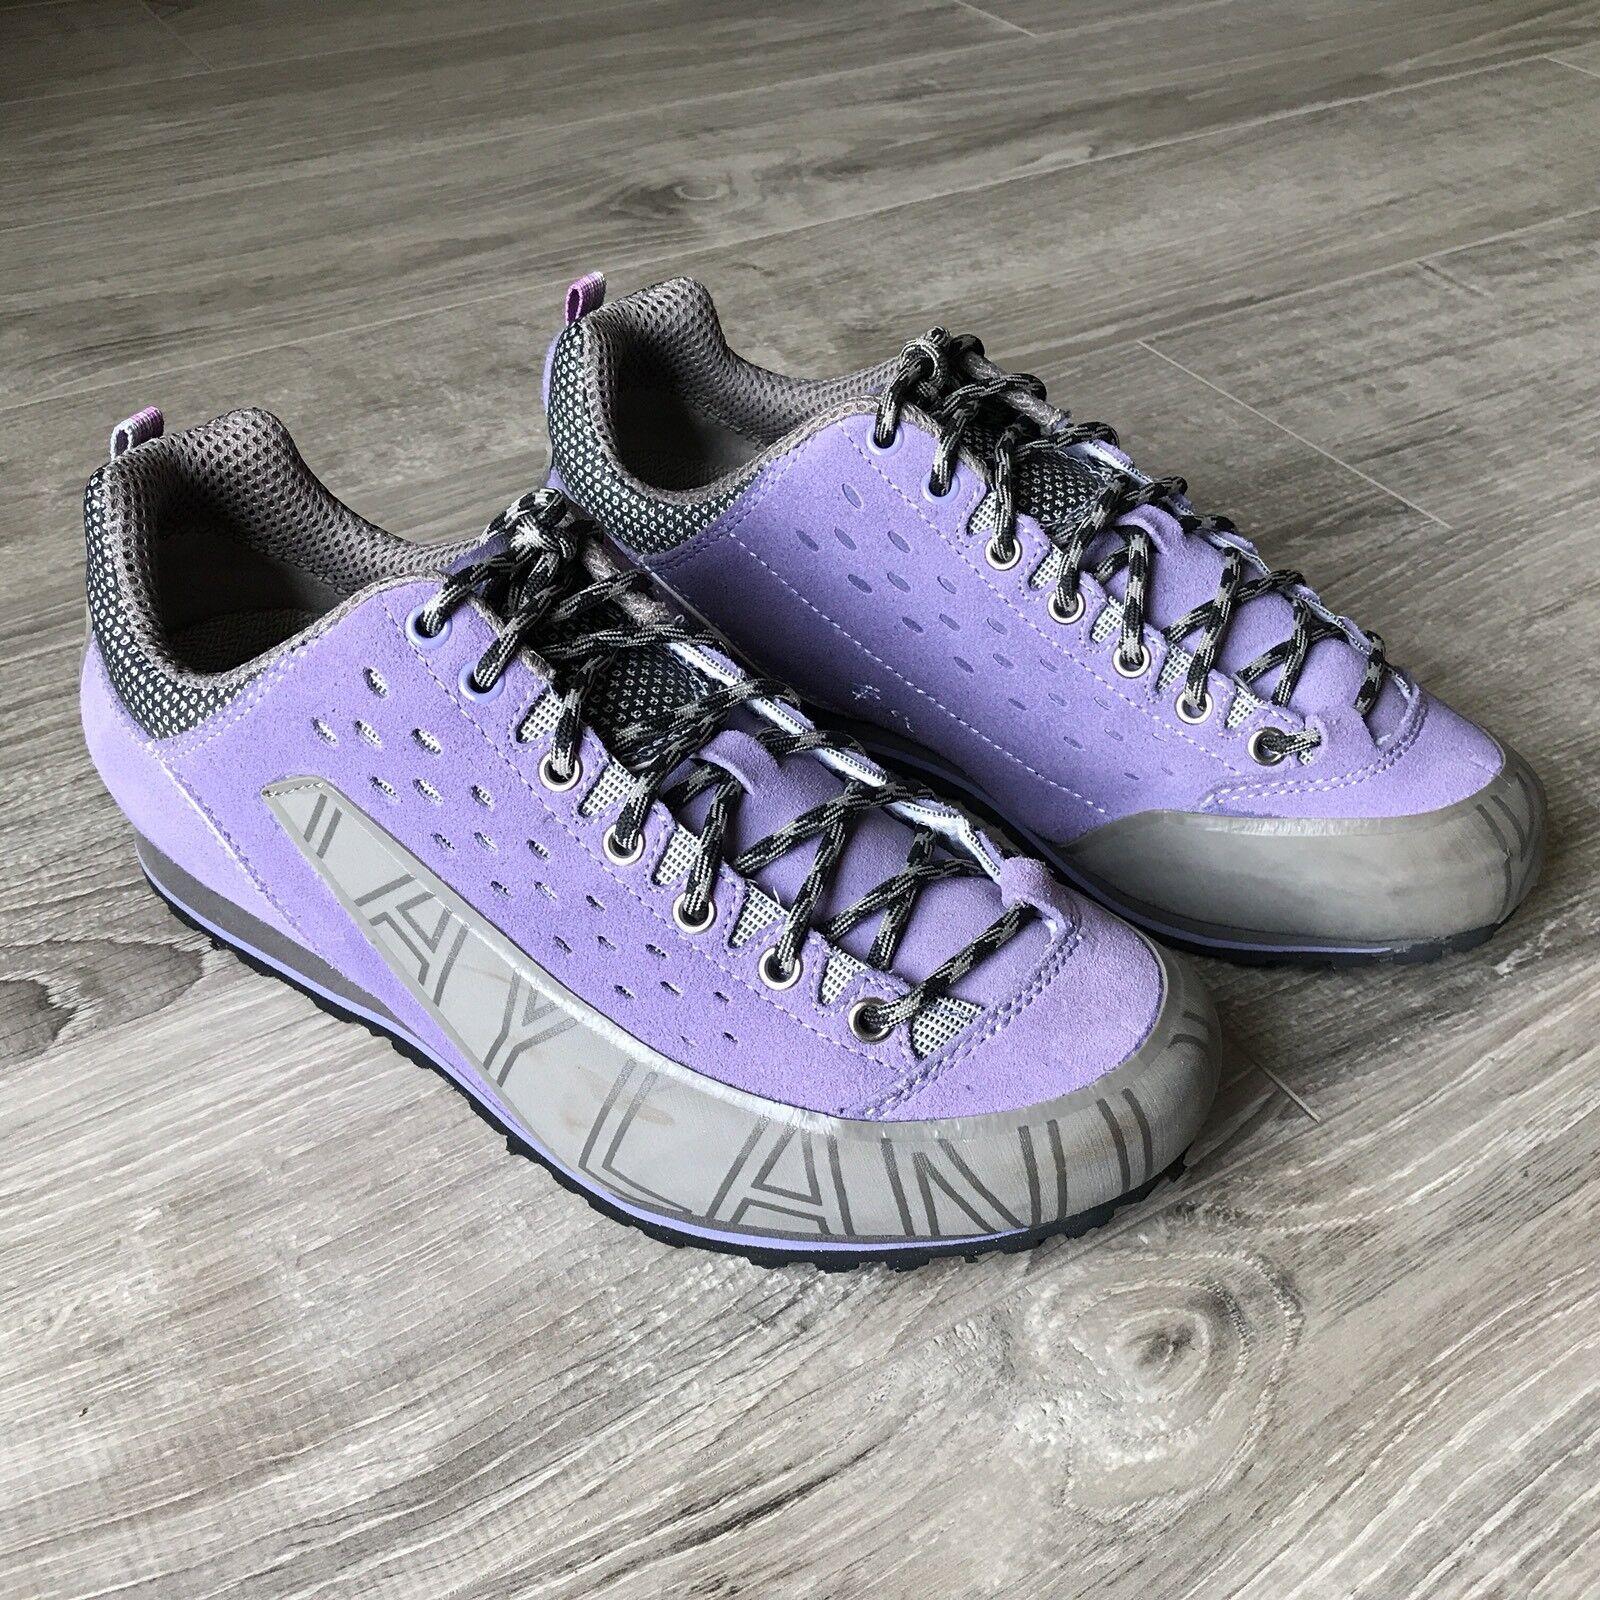 Kayland COMET Women's Shoes Purple Suede Hiking Climbing Outdoors Sz. 9